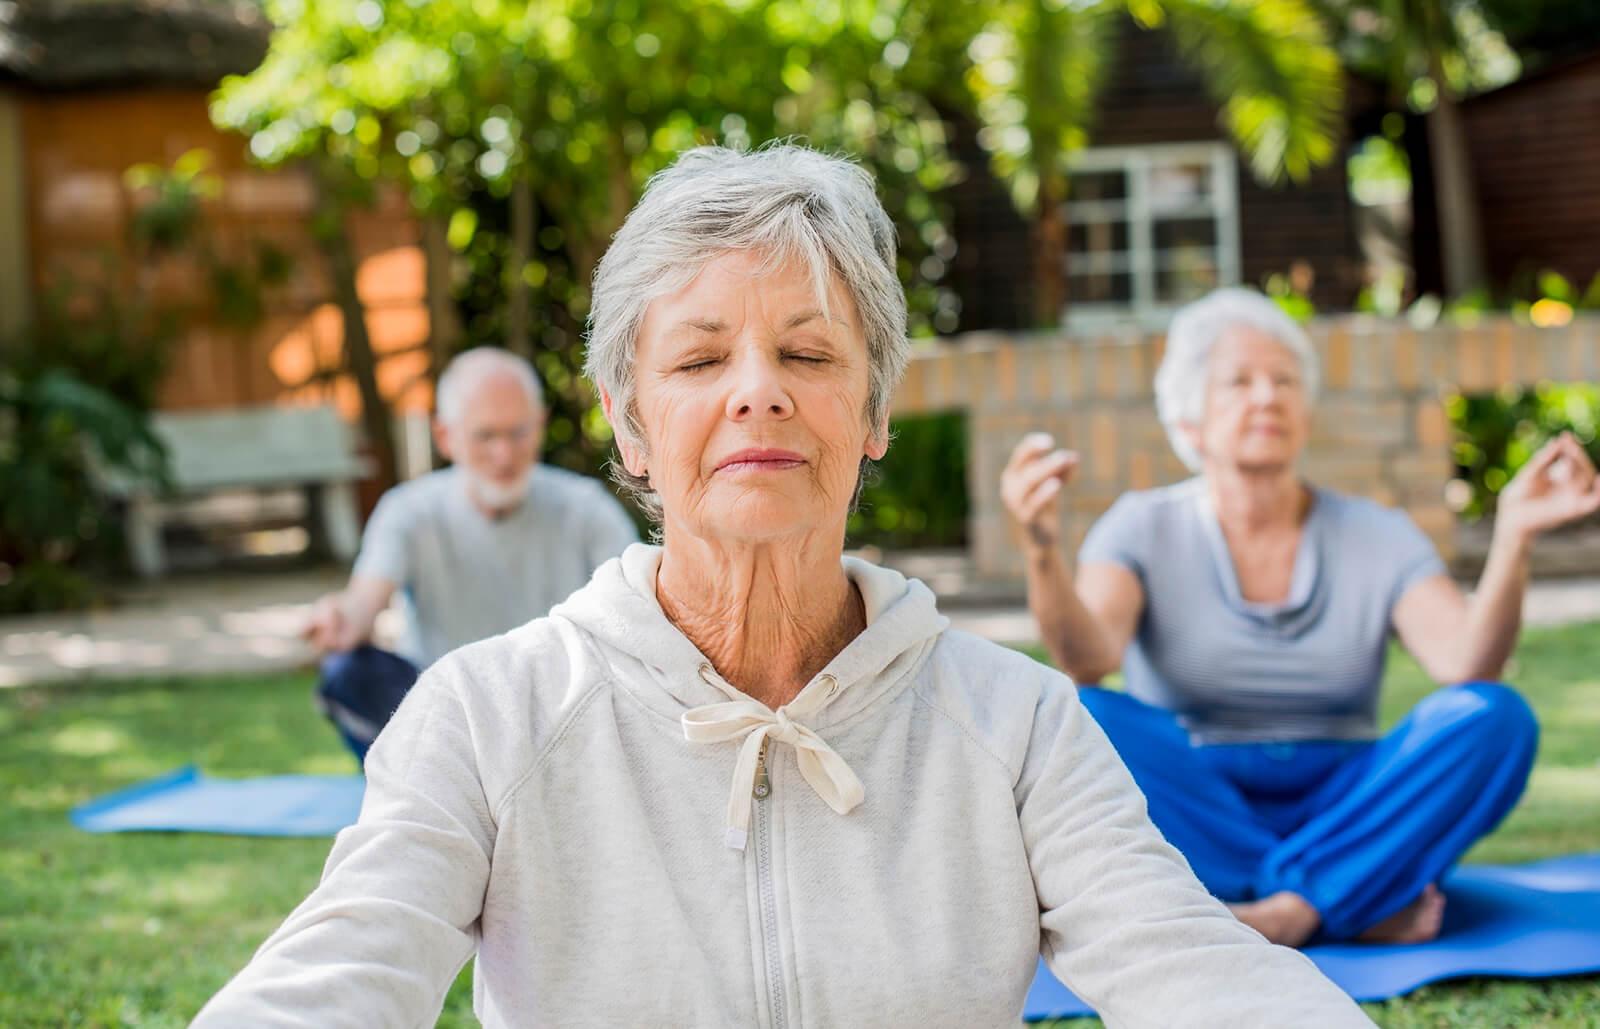 actividades-cognitivas-adultos-mayores.jpg